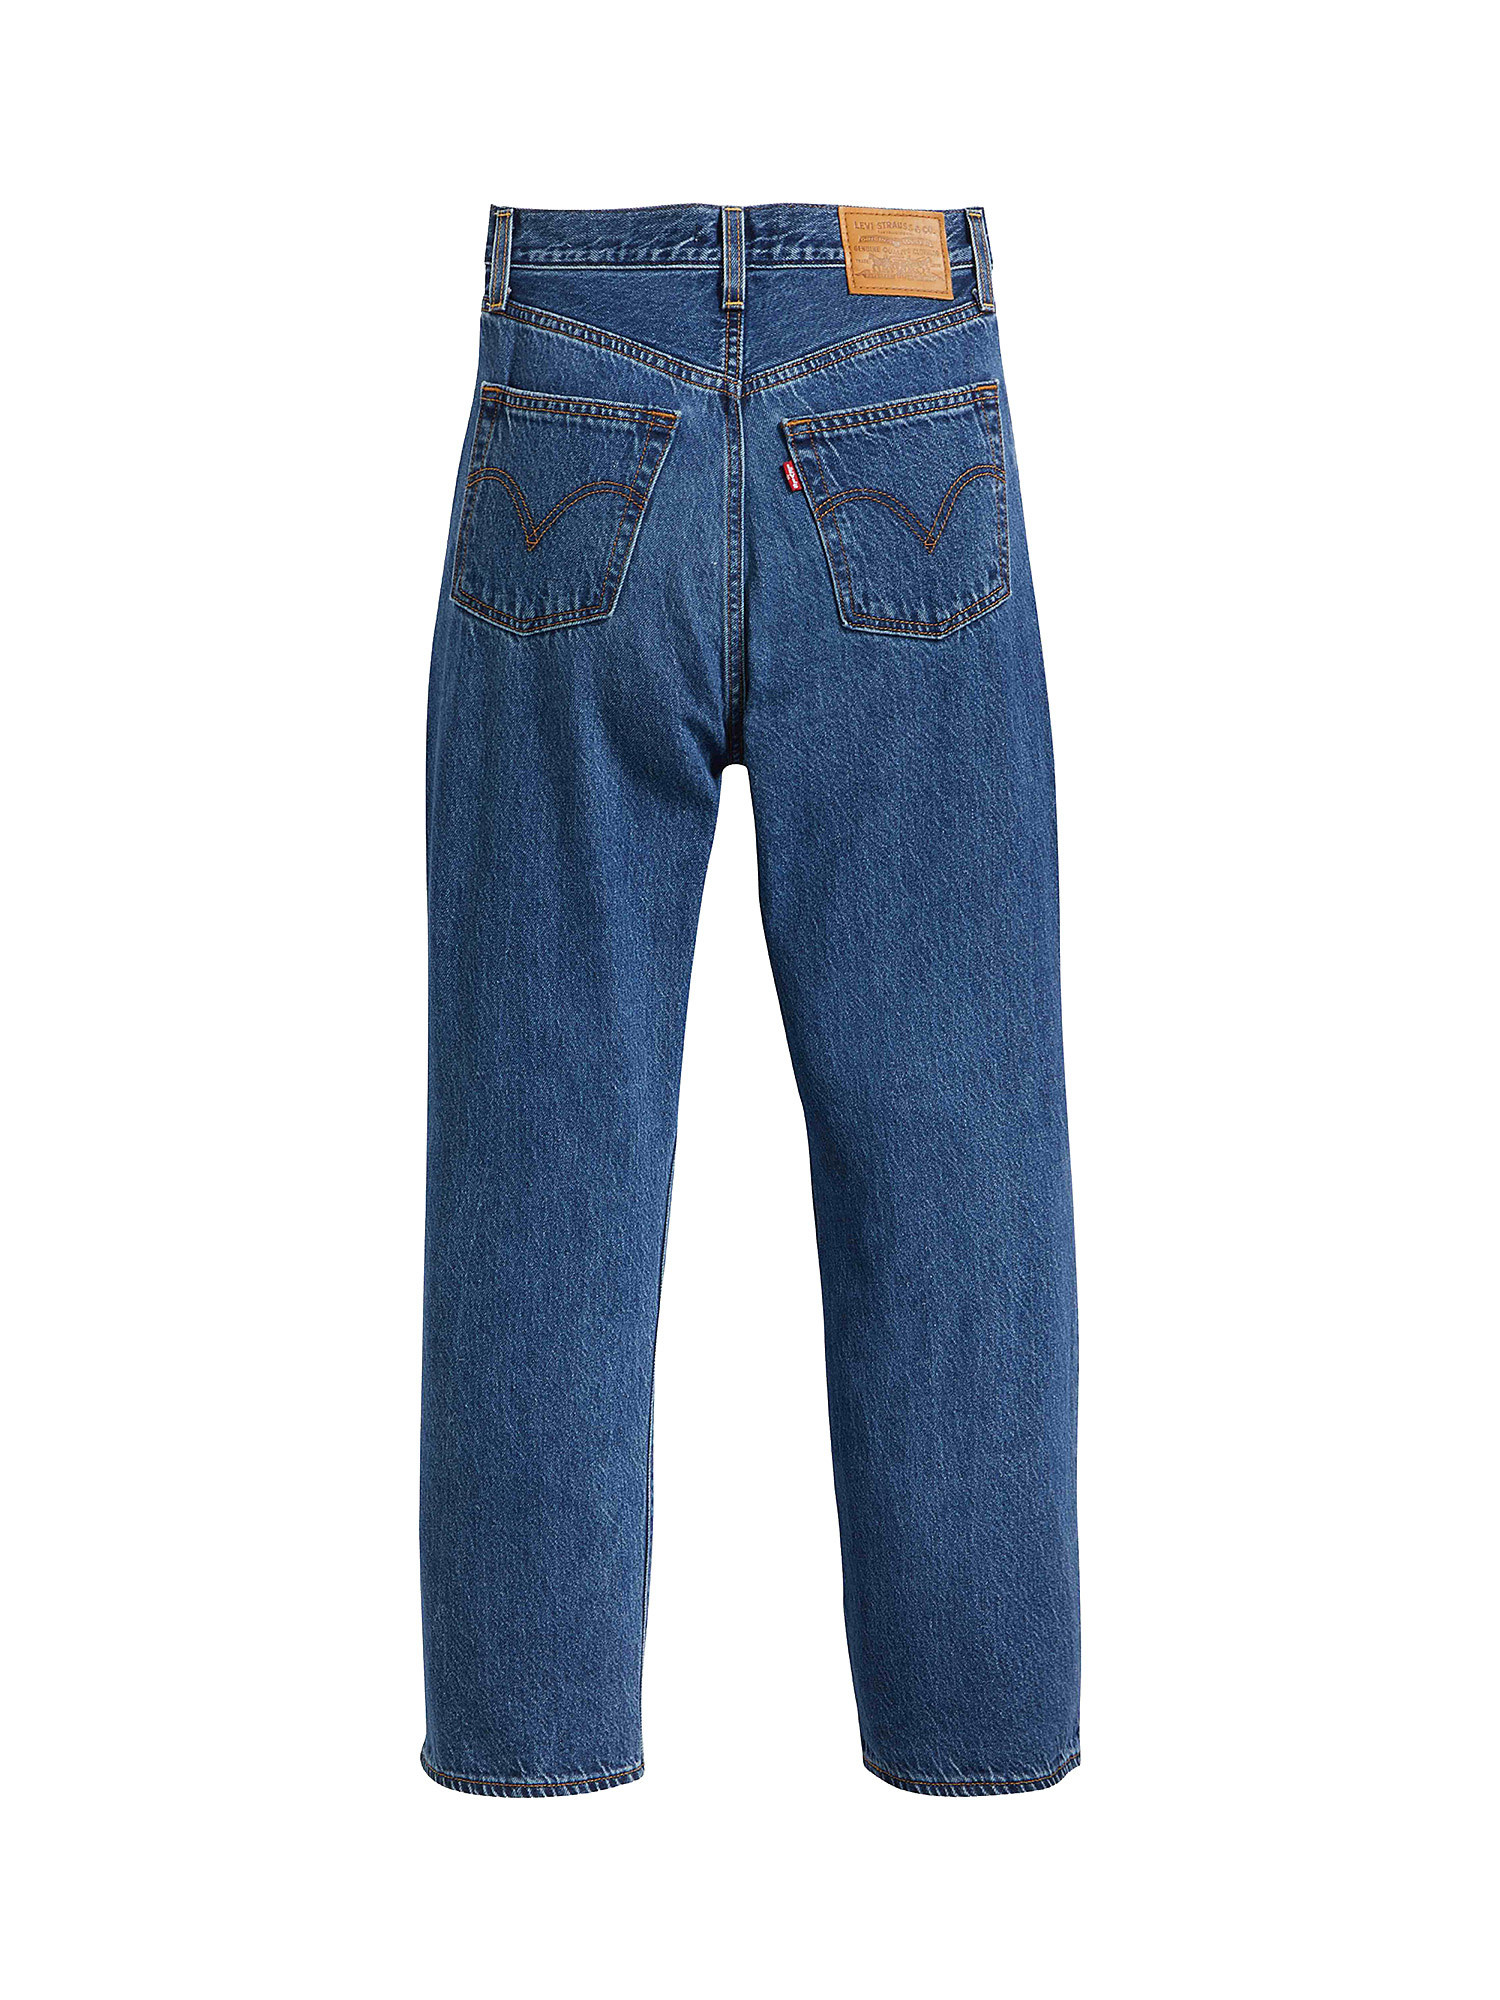 Jeans donna ribcage straight ankle, Denim, large image number 1